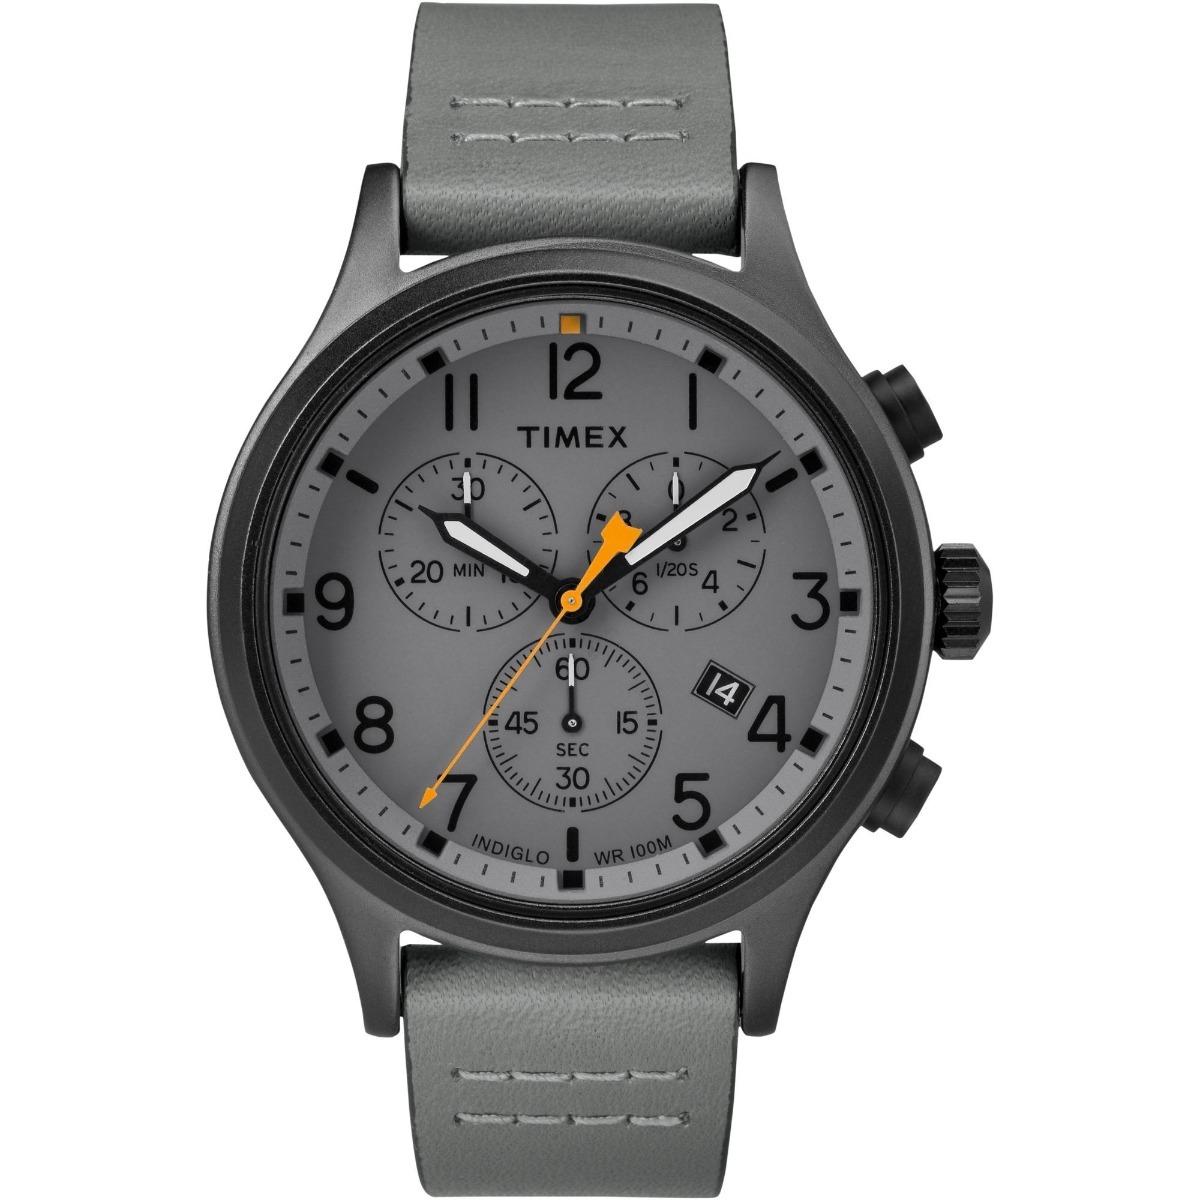 4cdbeb186f0f Reloj Timex Tw2r47400 Acero Inox Ext Piel Gris Multidial  él ...